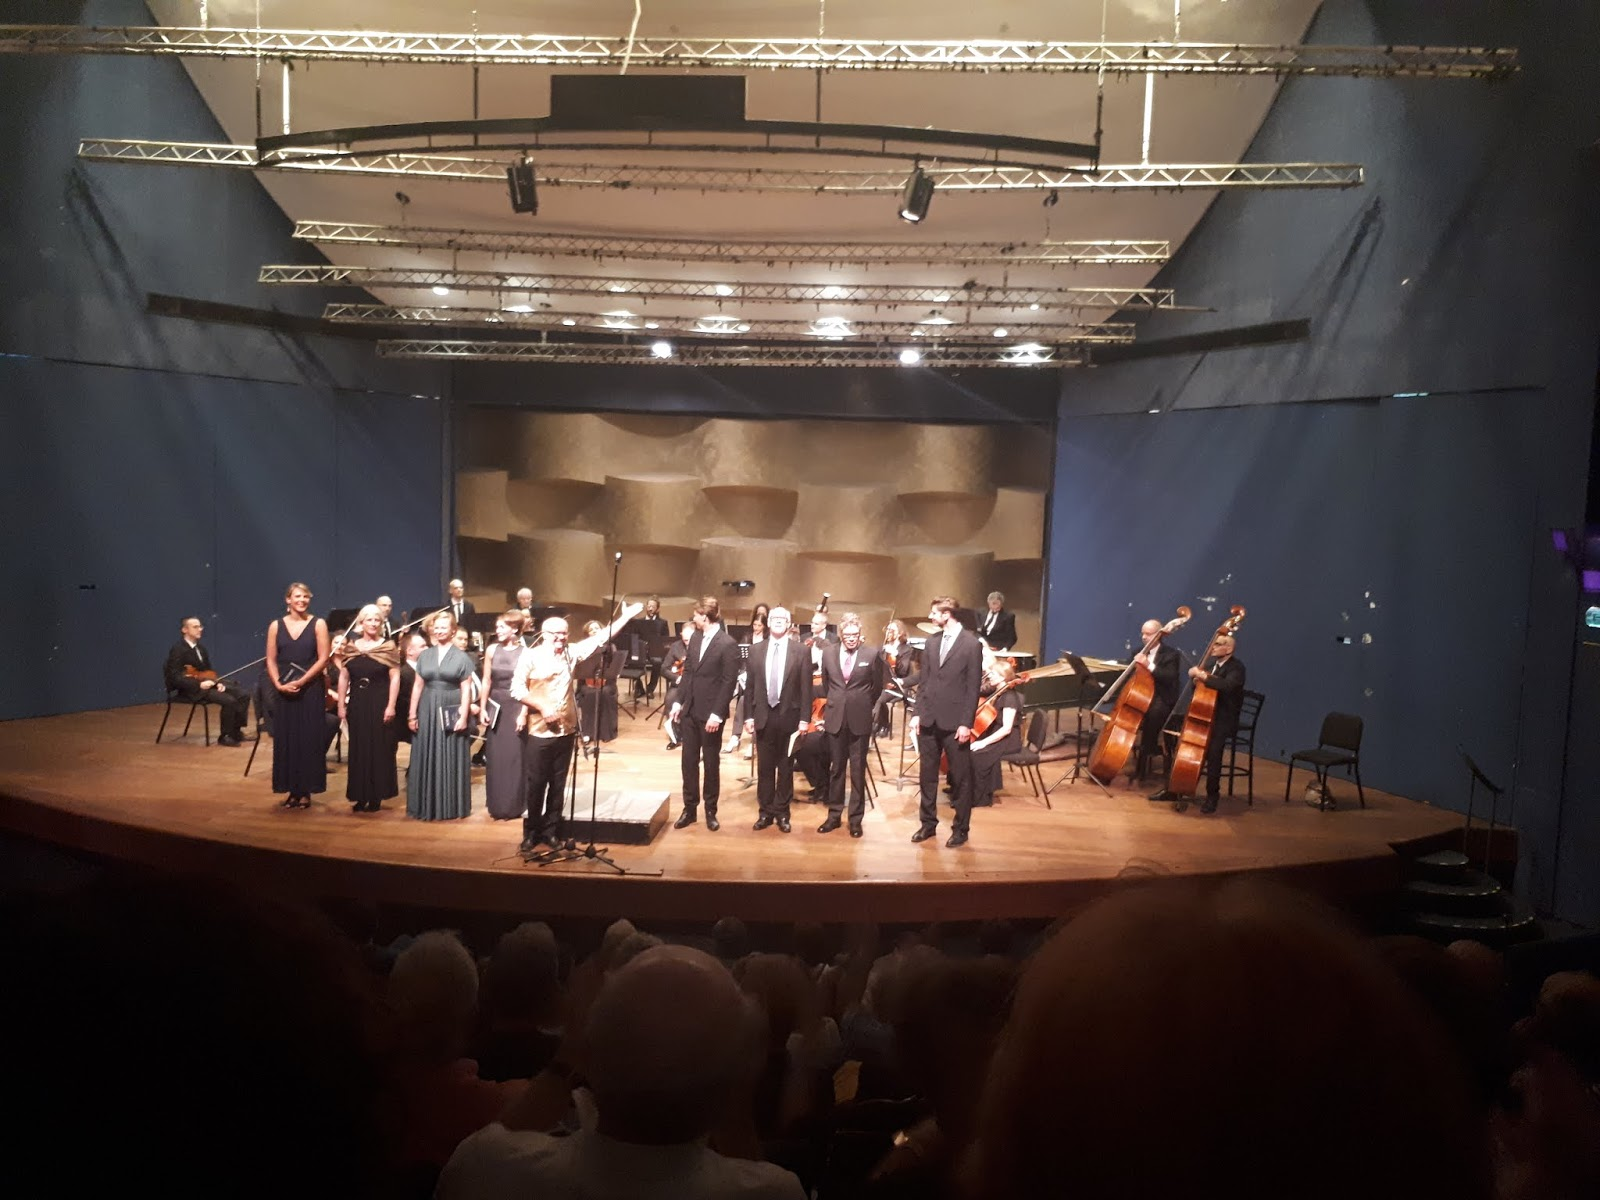 Pamela Hickman S Concert Critique Blog October 2018